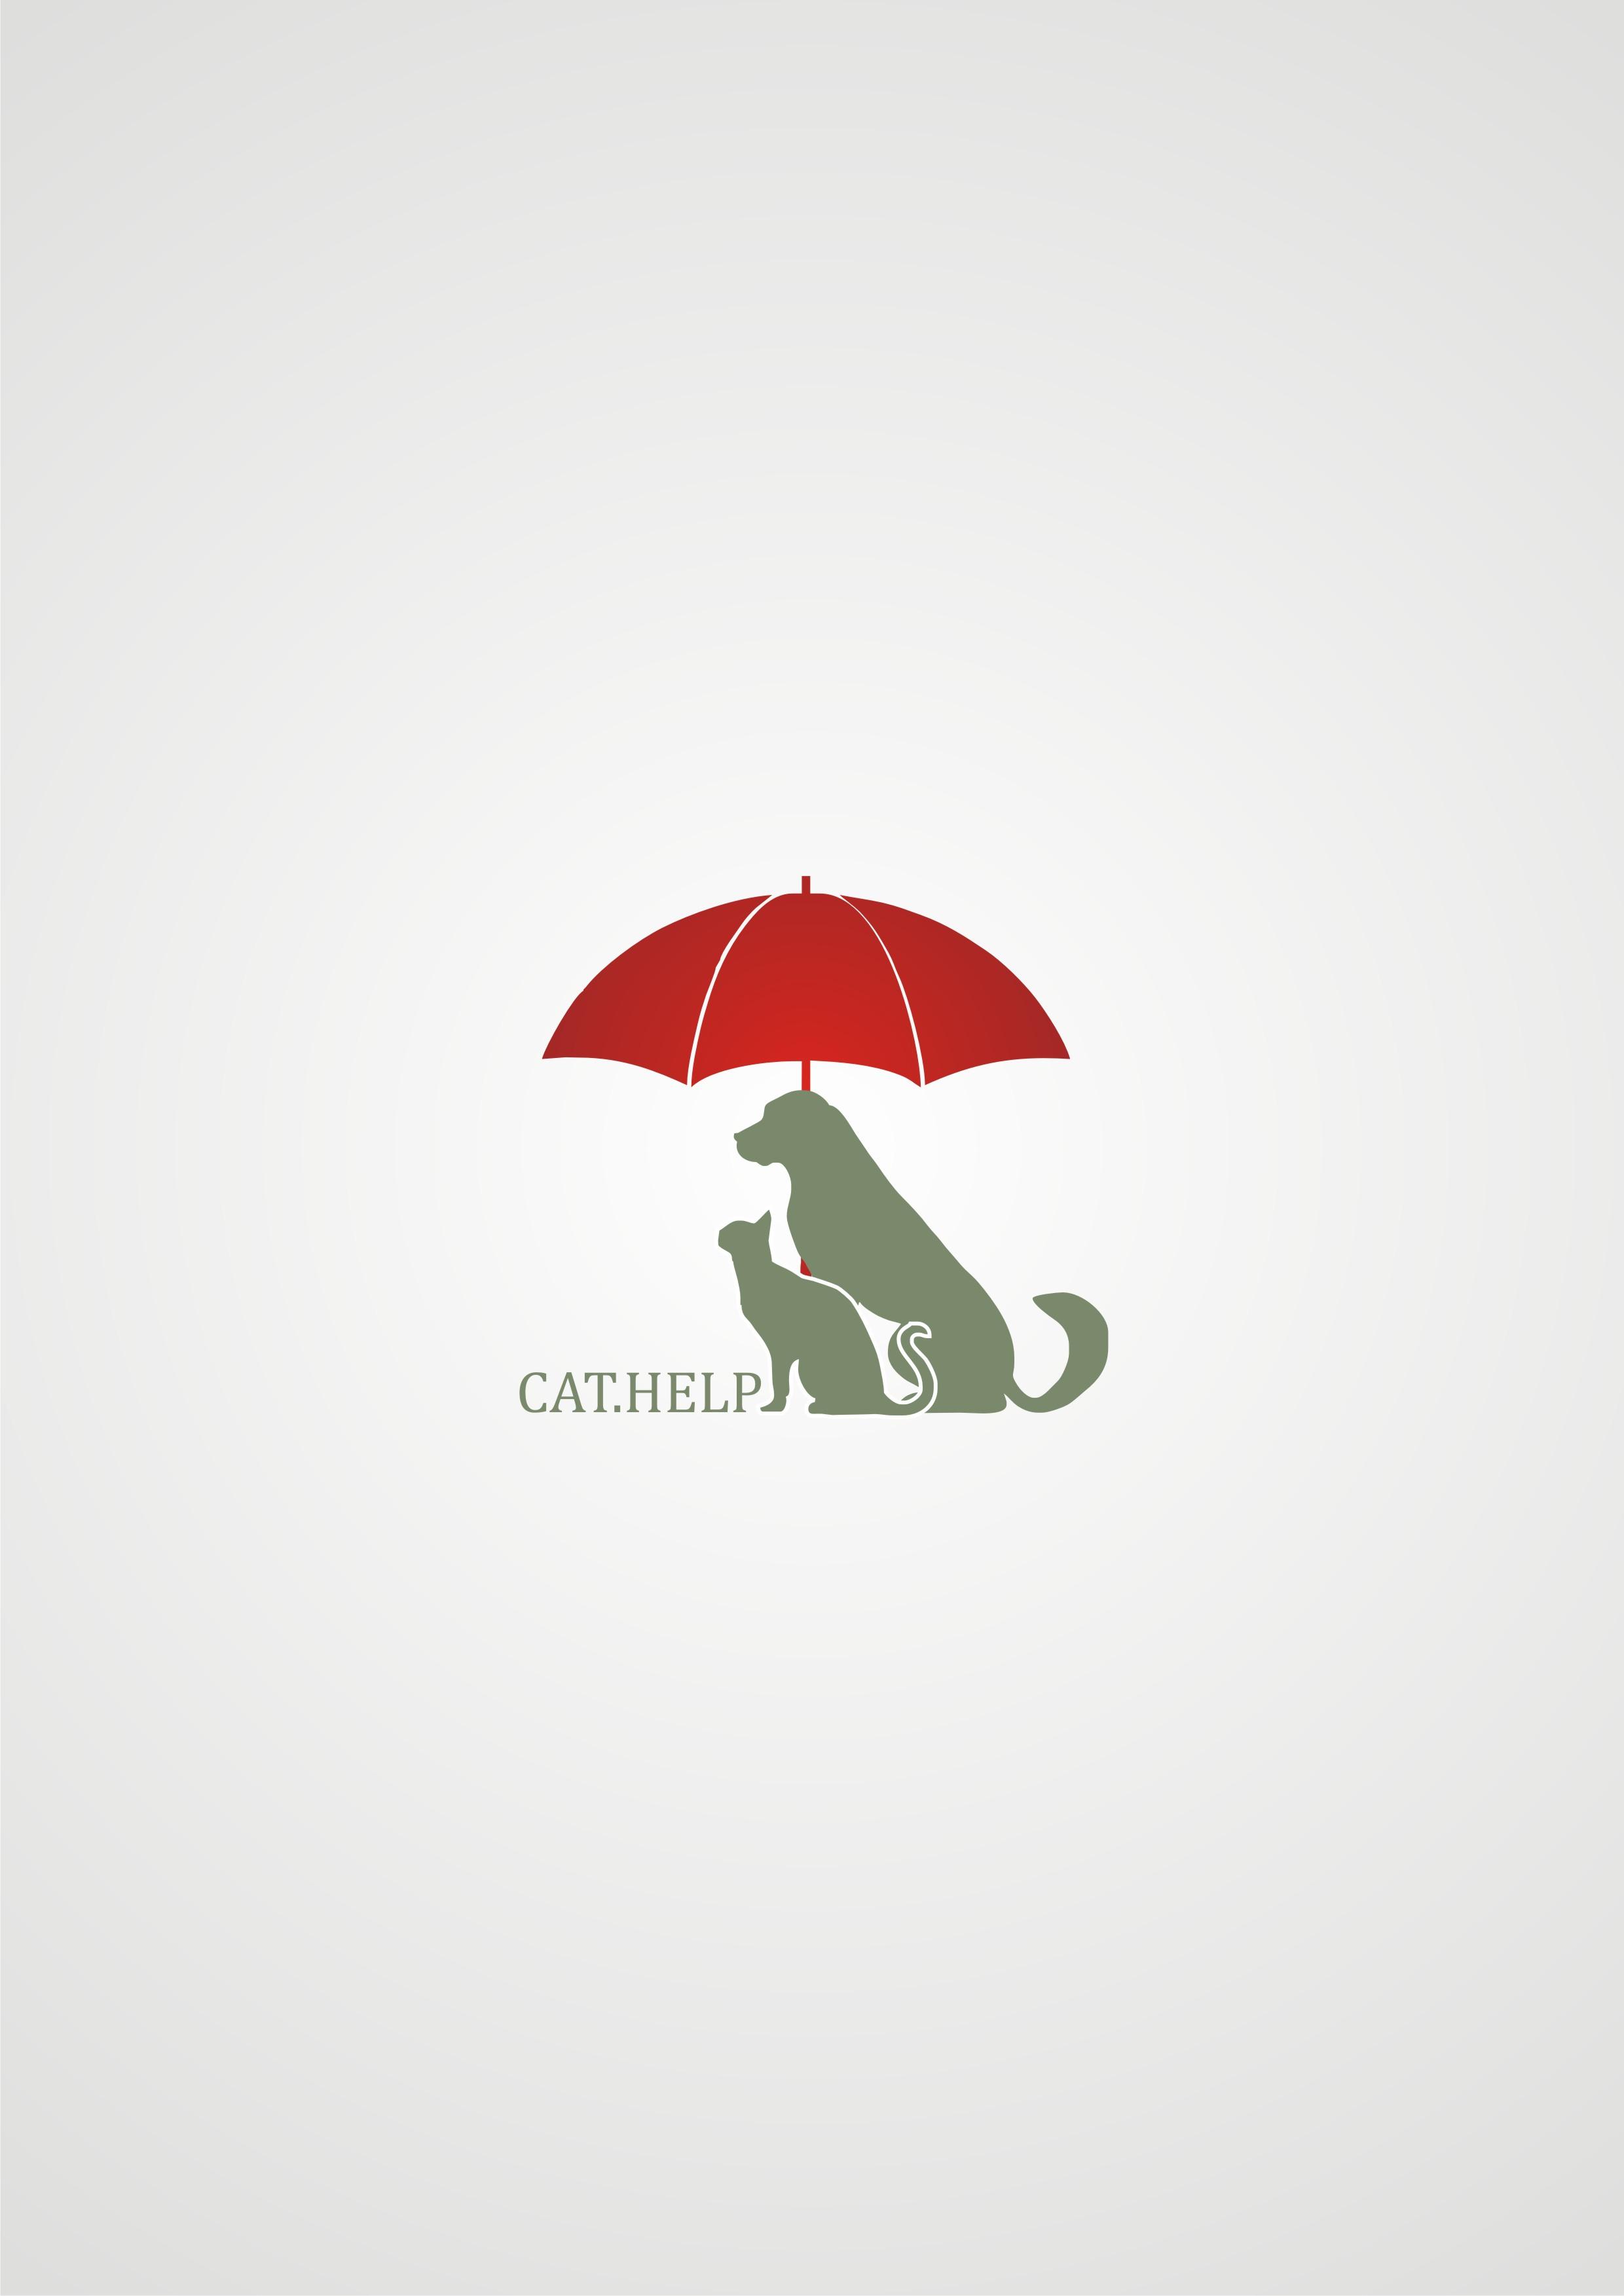 логотип для сайта и группы вк - cat.help фото f_57059ddb01e8587a.jpg